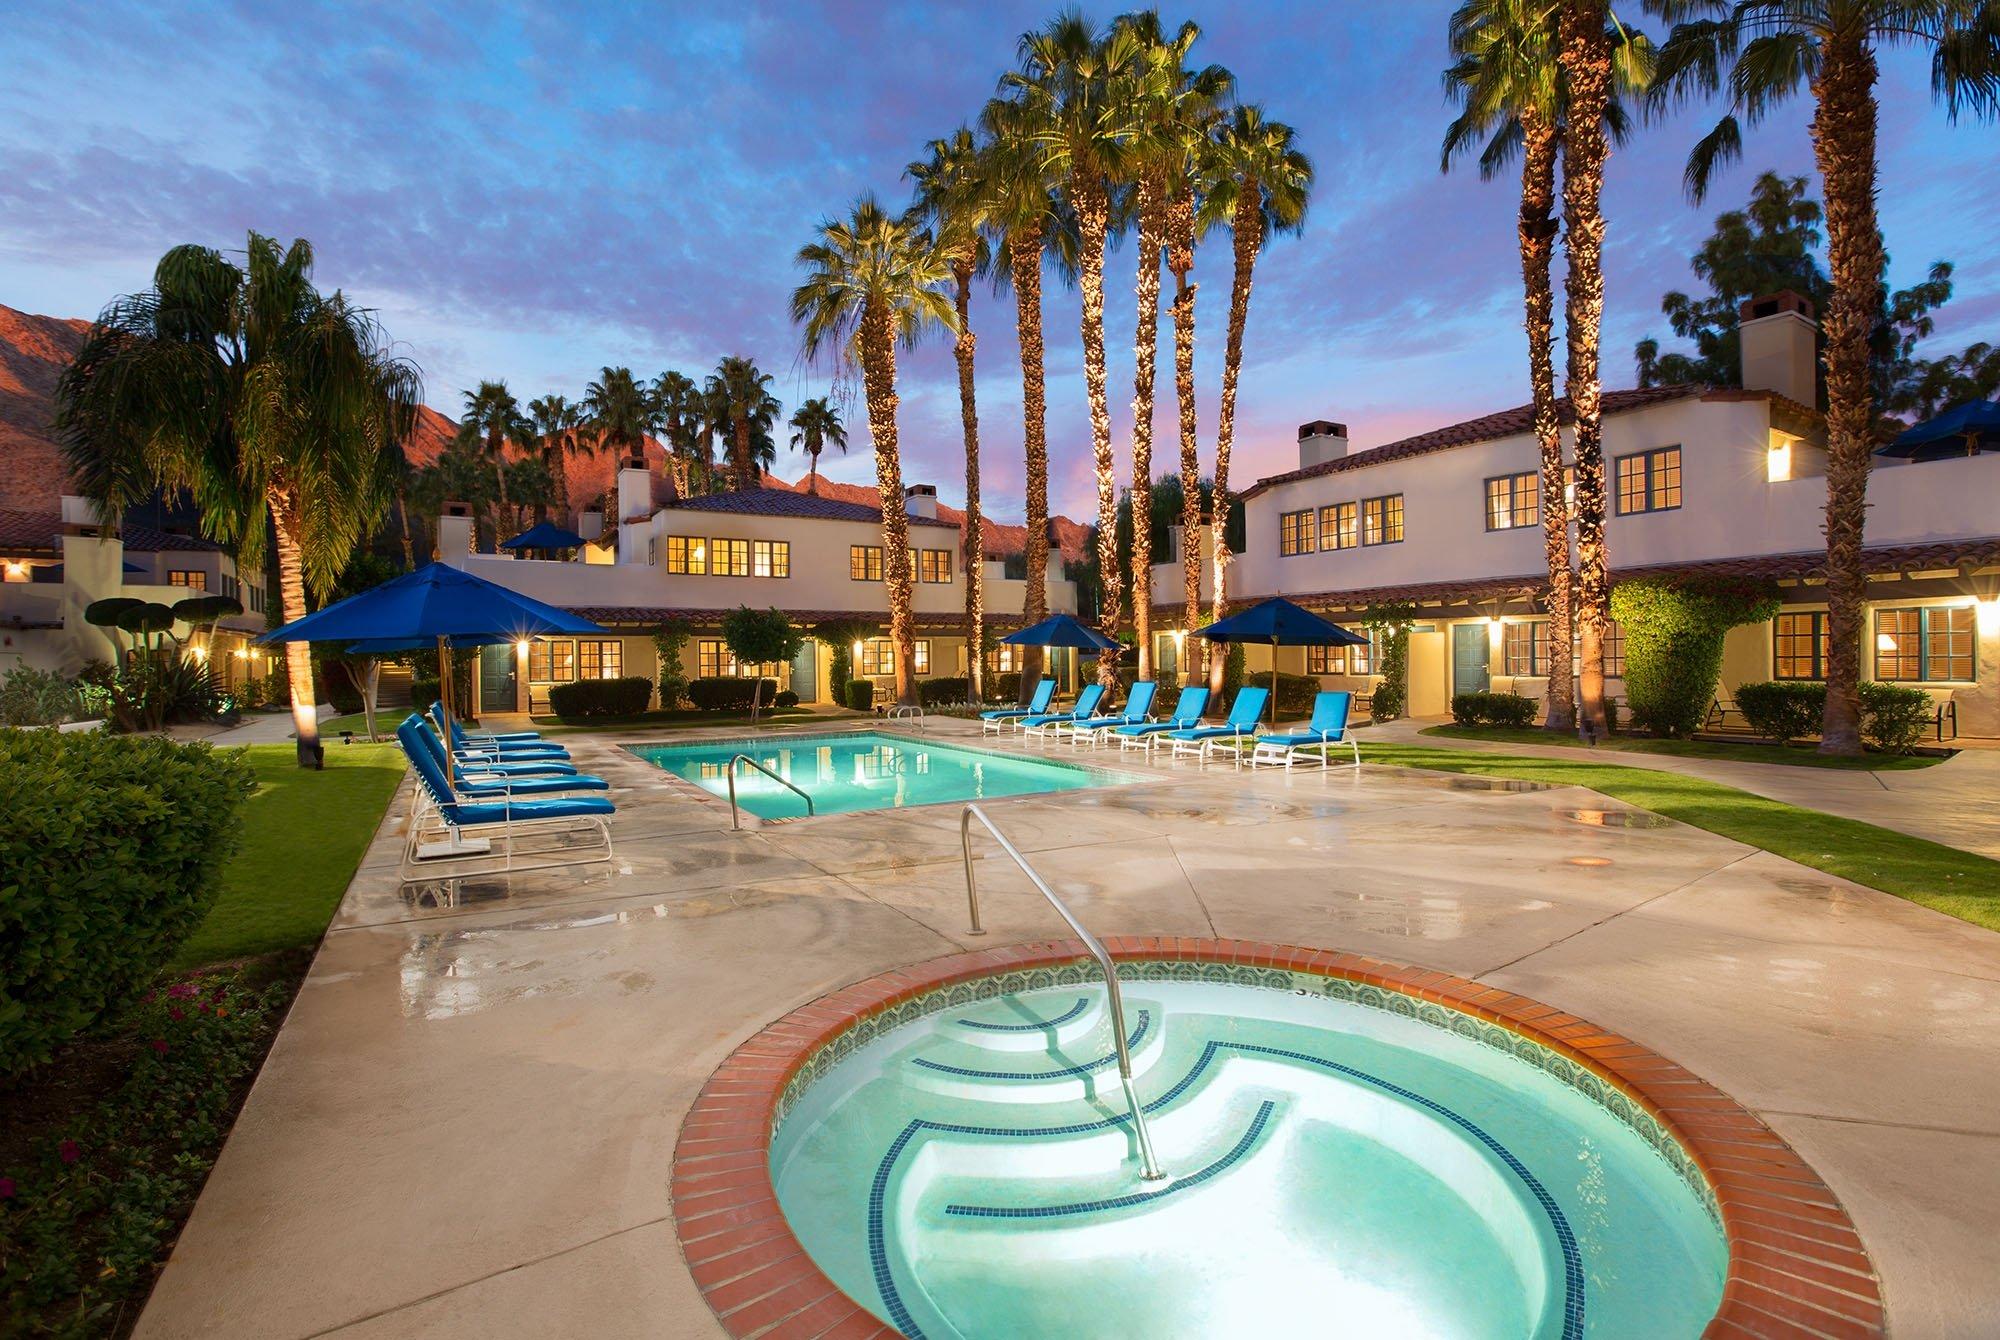 Golf Dreams 2017 Hotel La Quinta Pool c Creative Vision Group INC